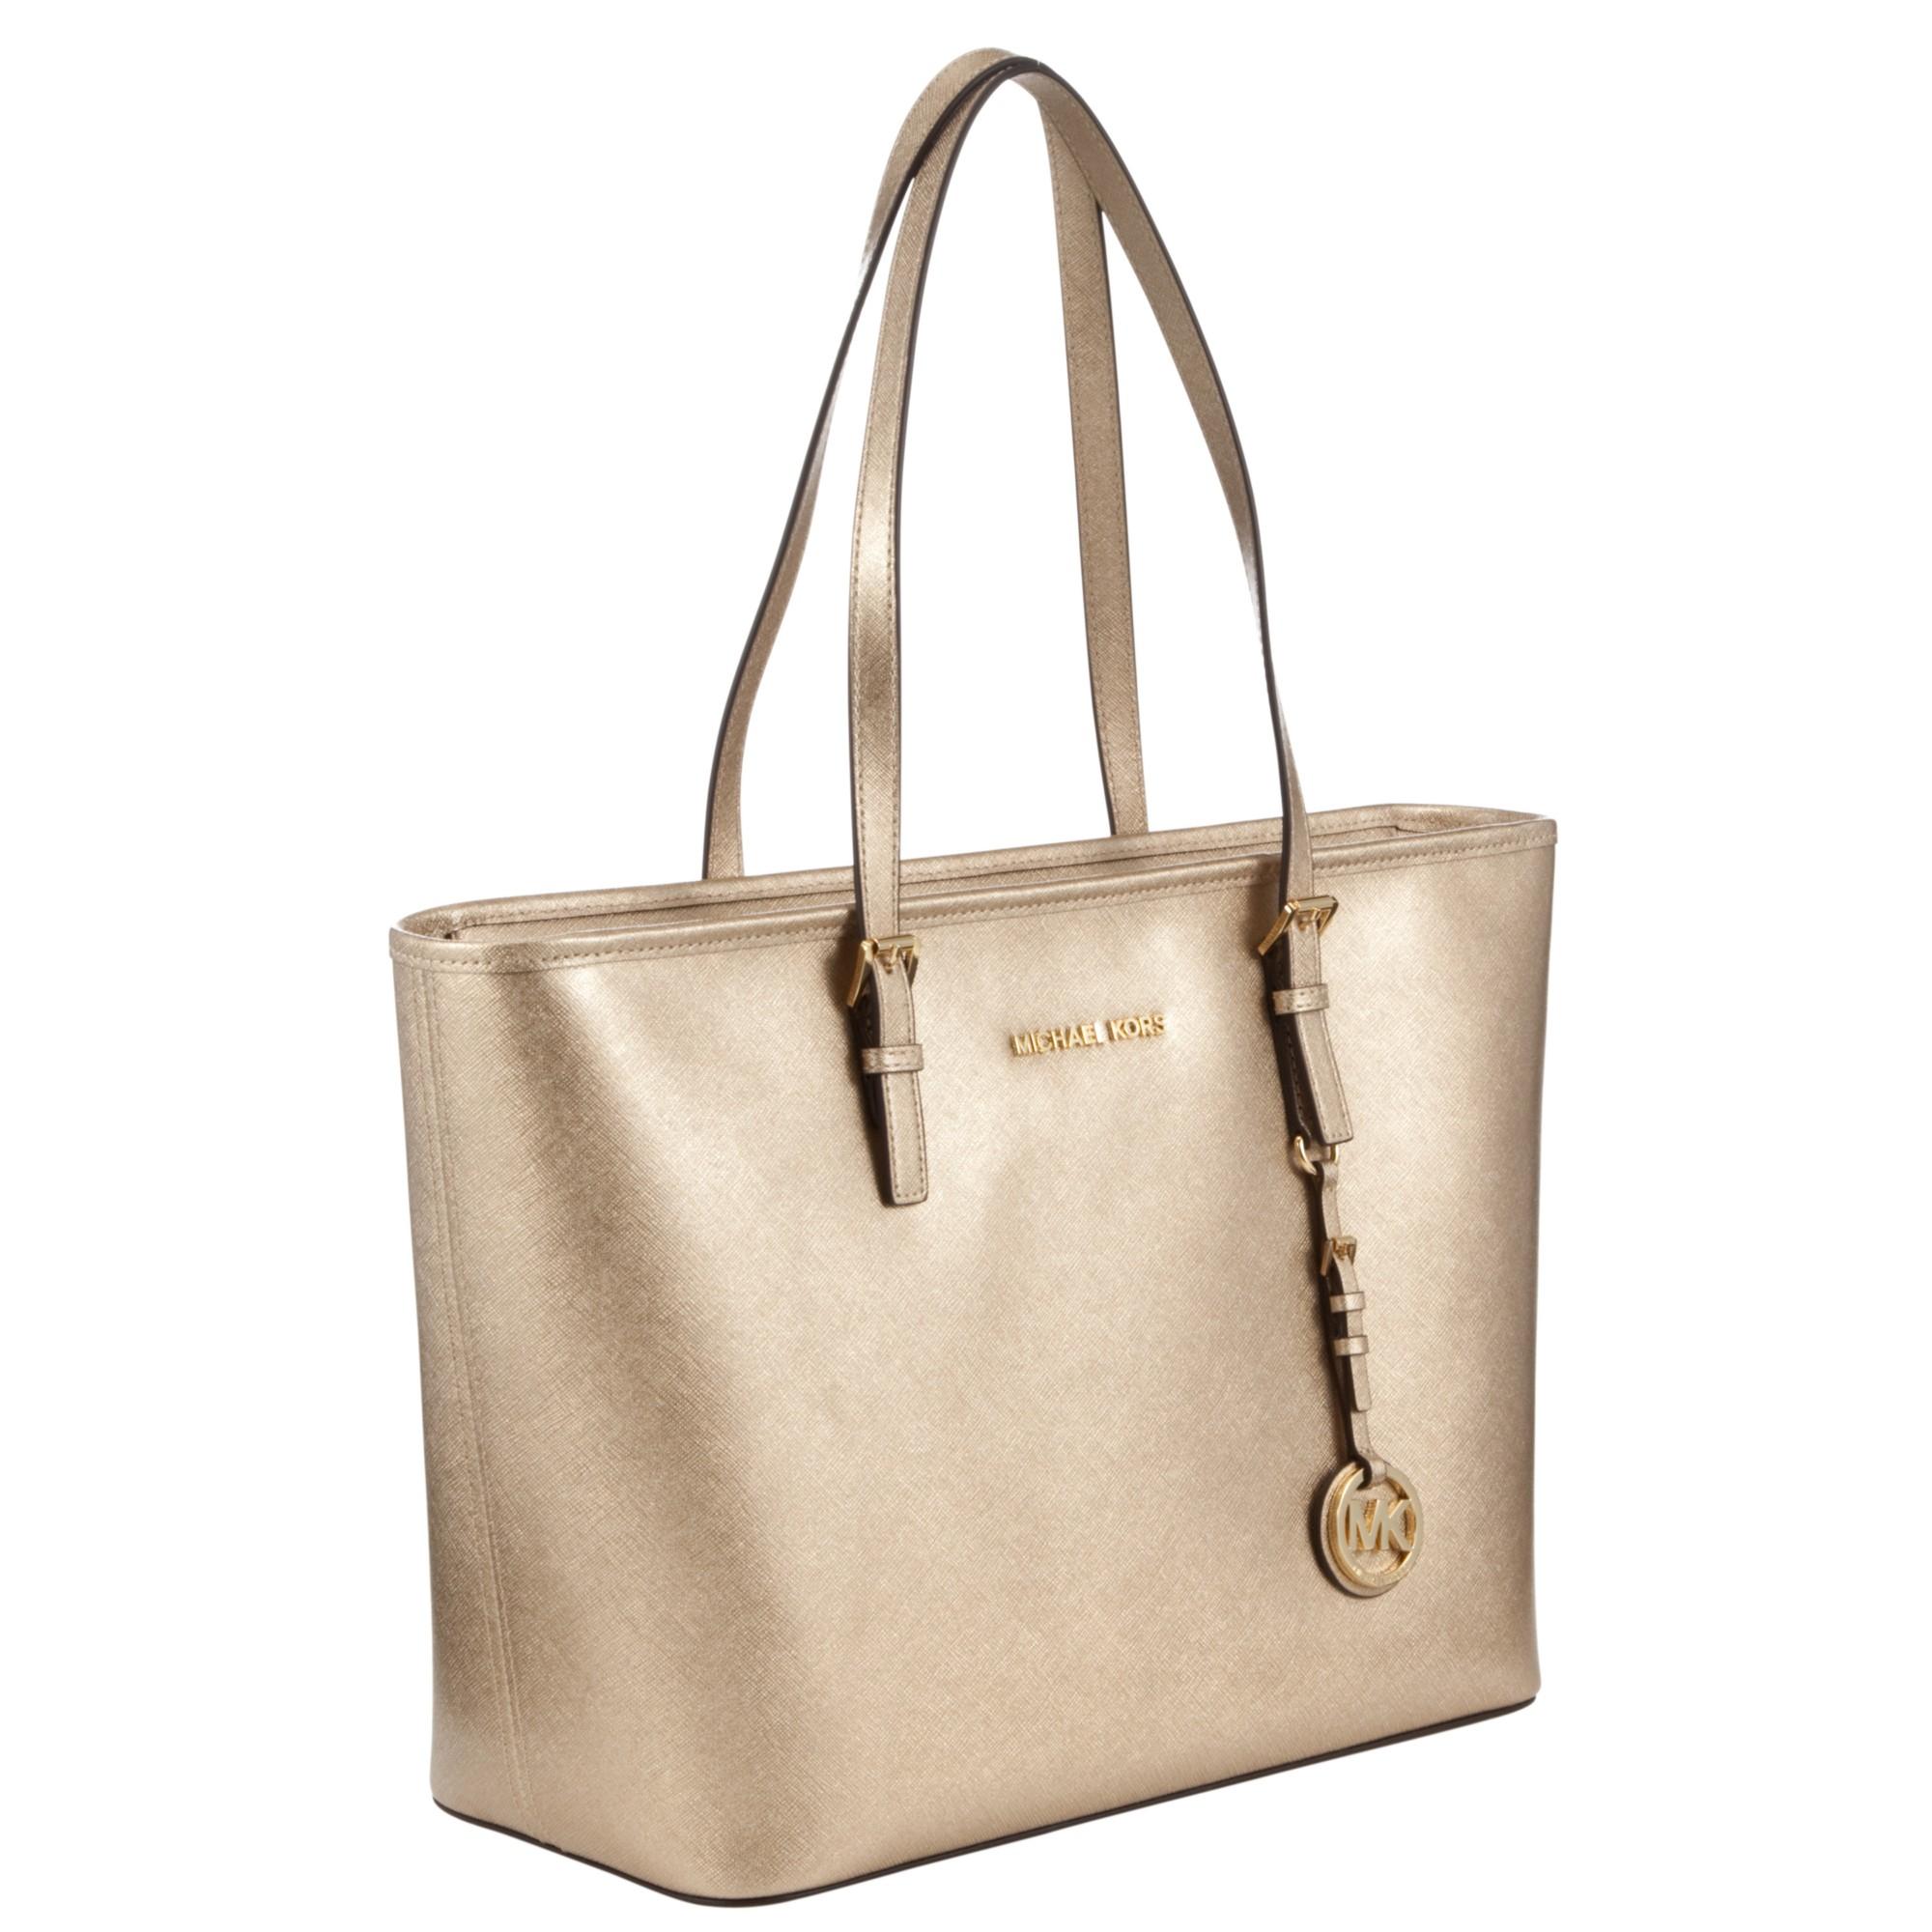 815917dc24b8e MICHAEL Michael Kors Jet Set Travel Saffiano Leather Tote Bag in ...